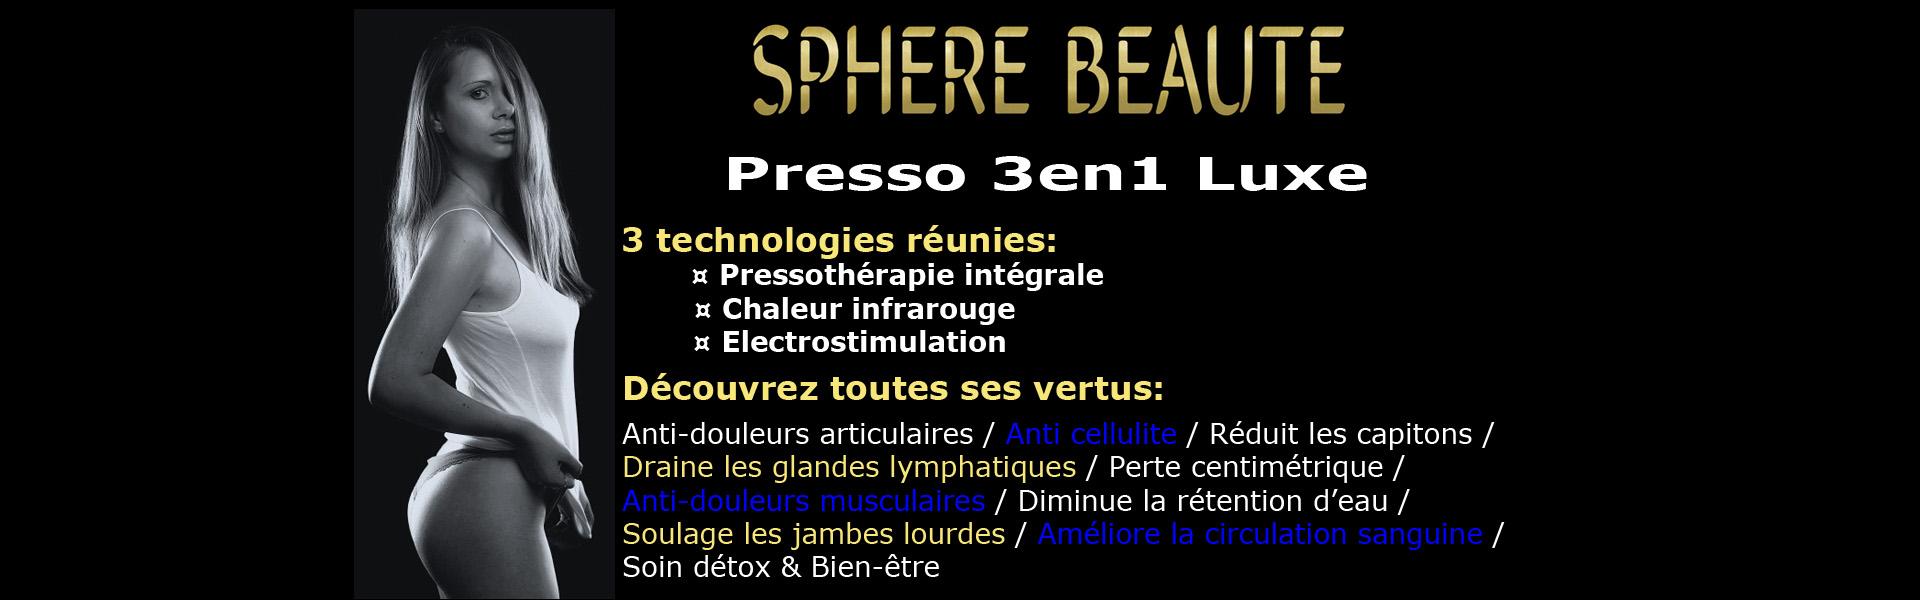 Diapo_Sphere_Beaute_01